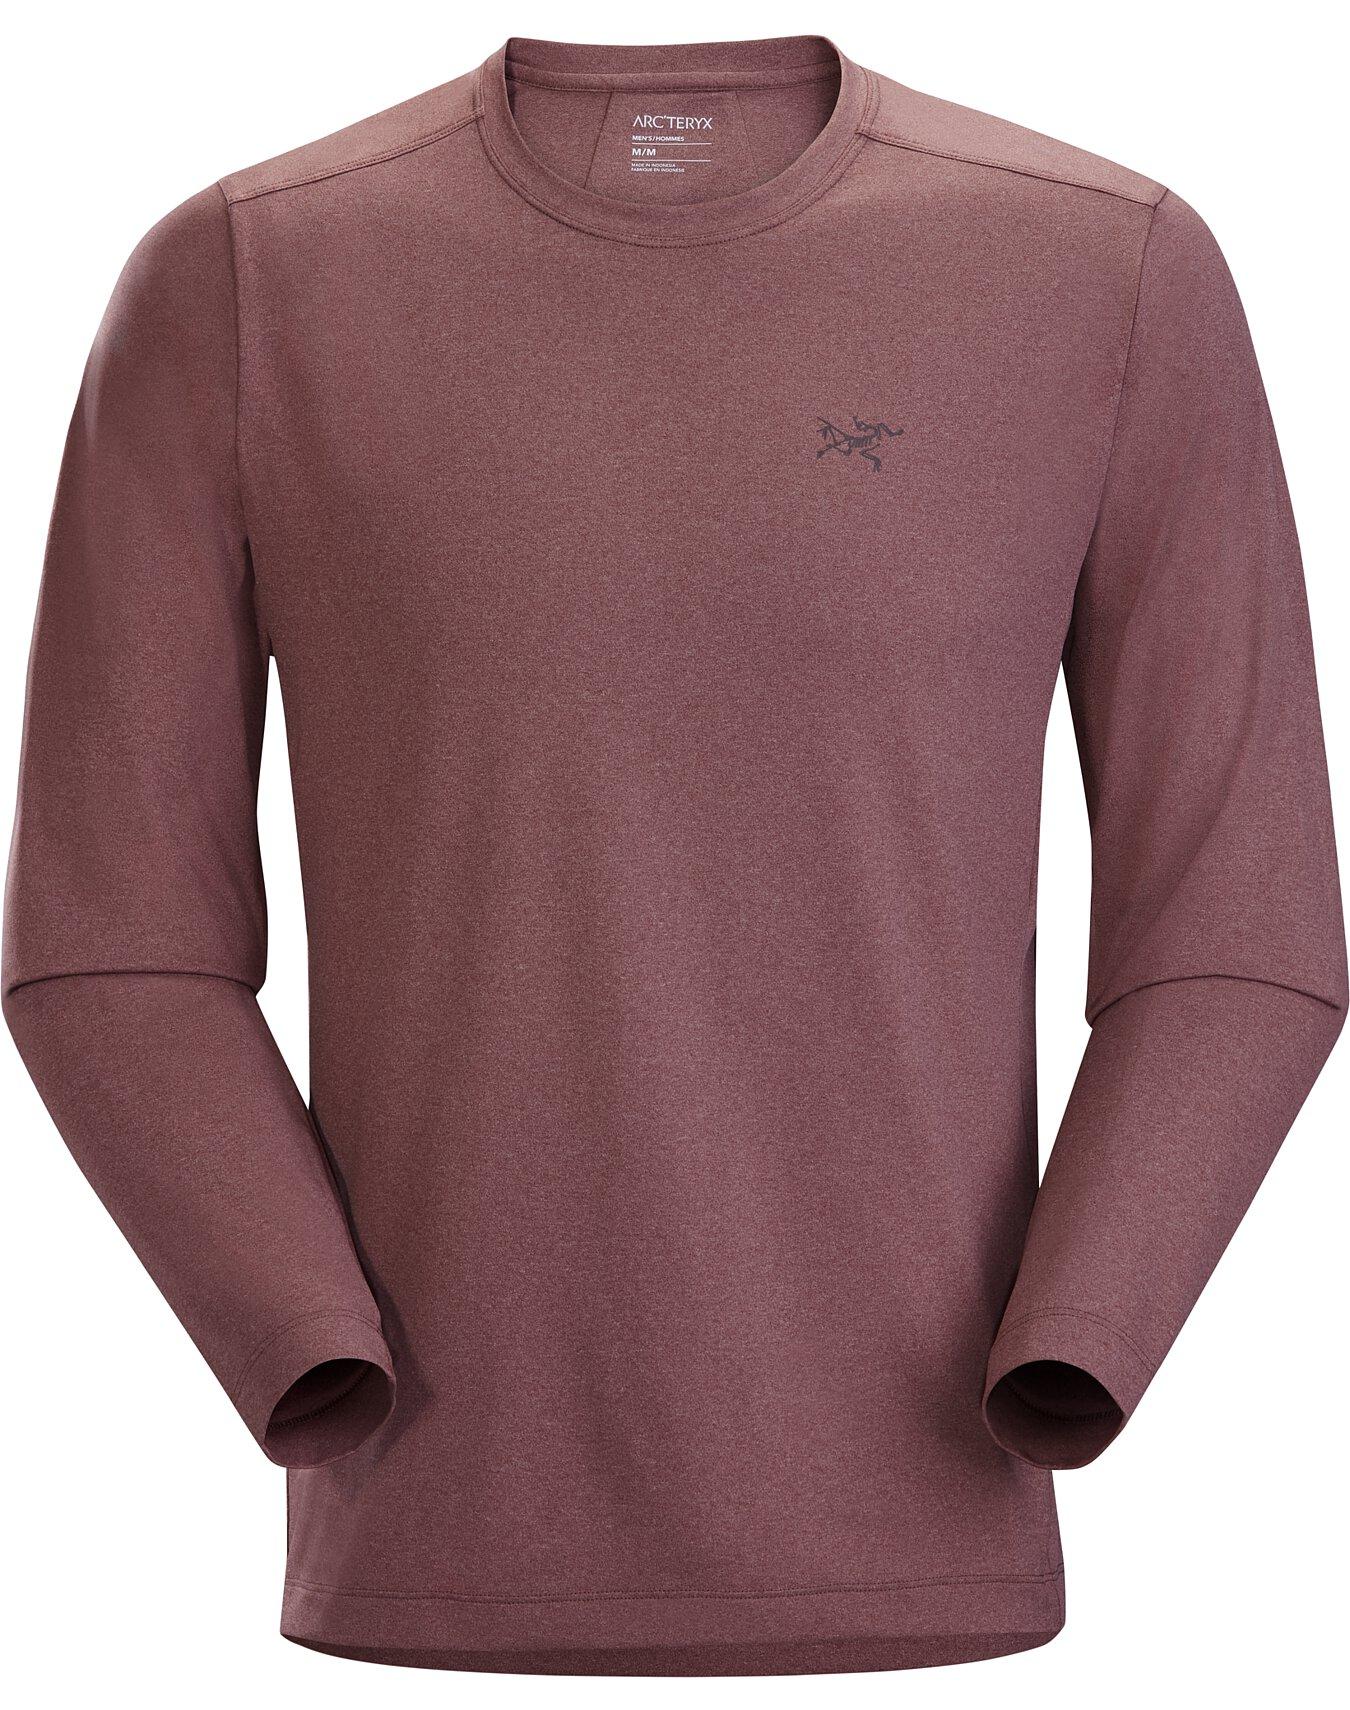 Remige Shirt LS Men's